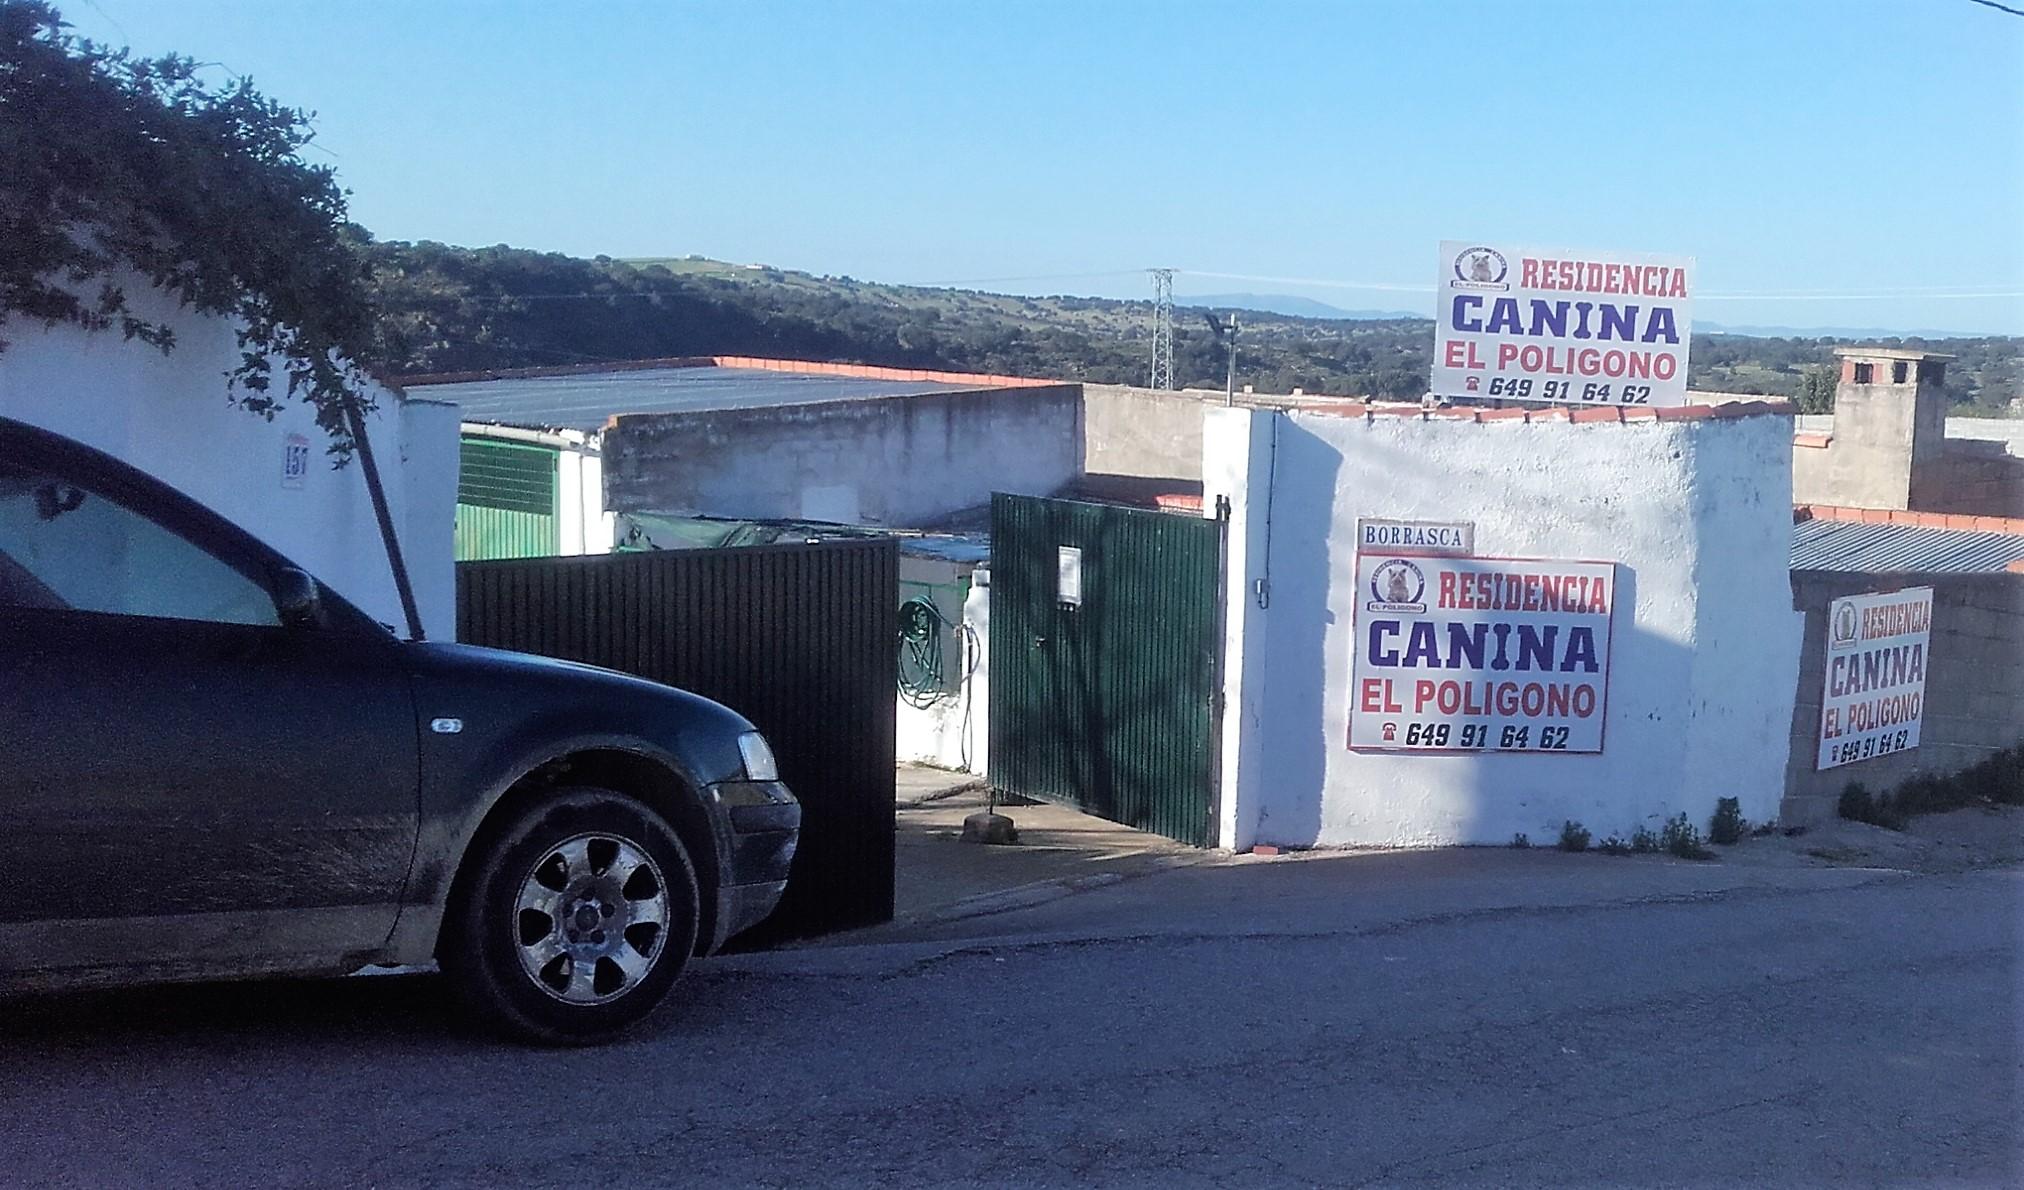 Residencia Canina Cáceres El Polígono